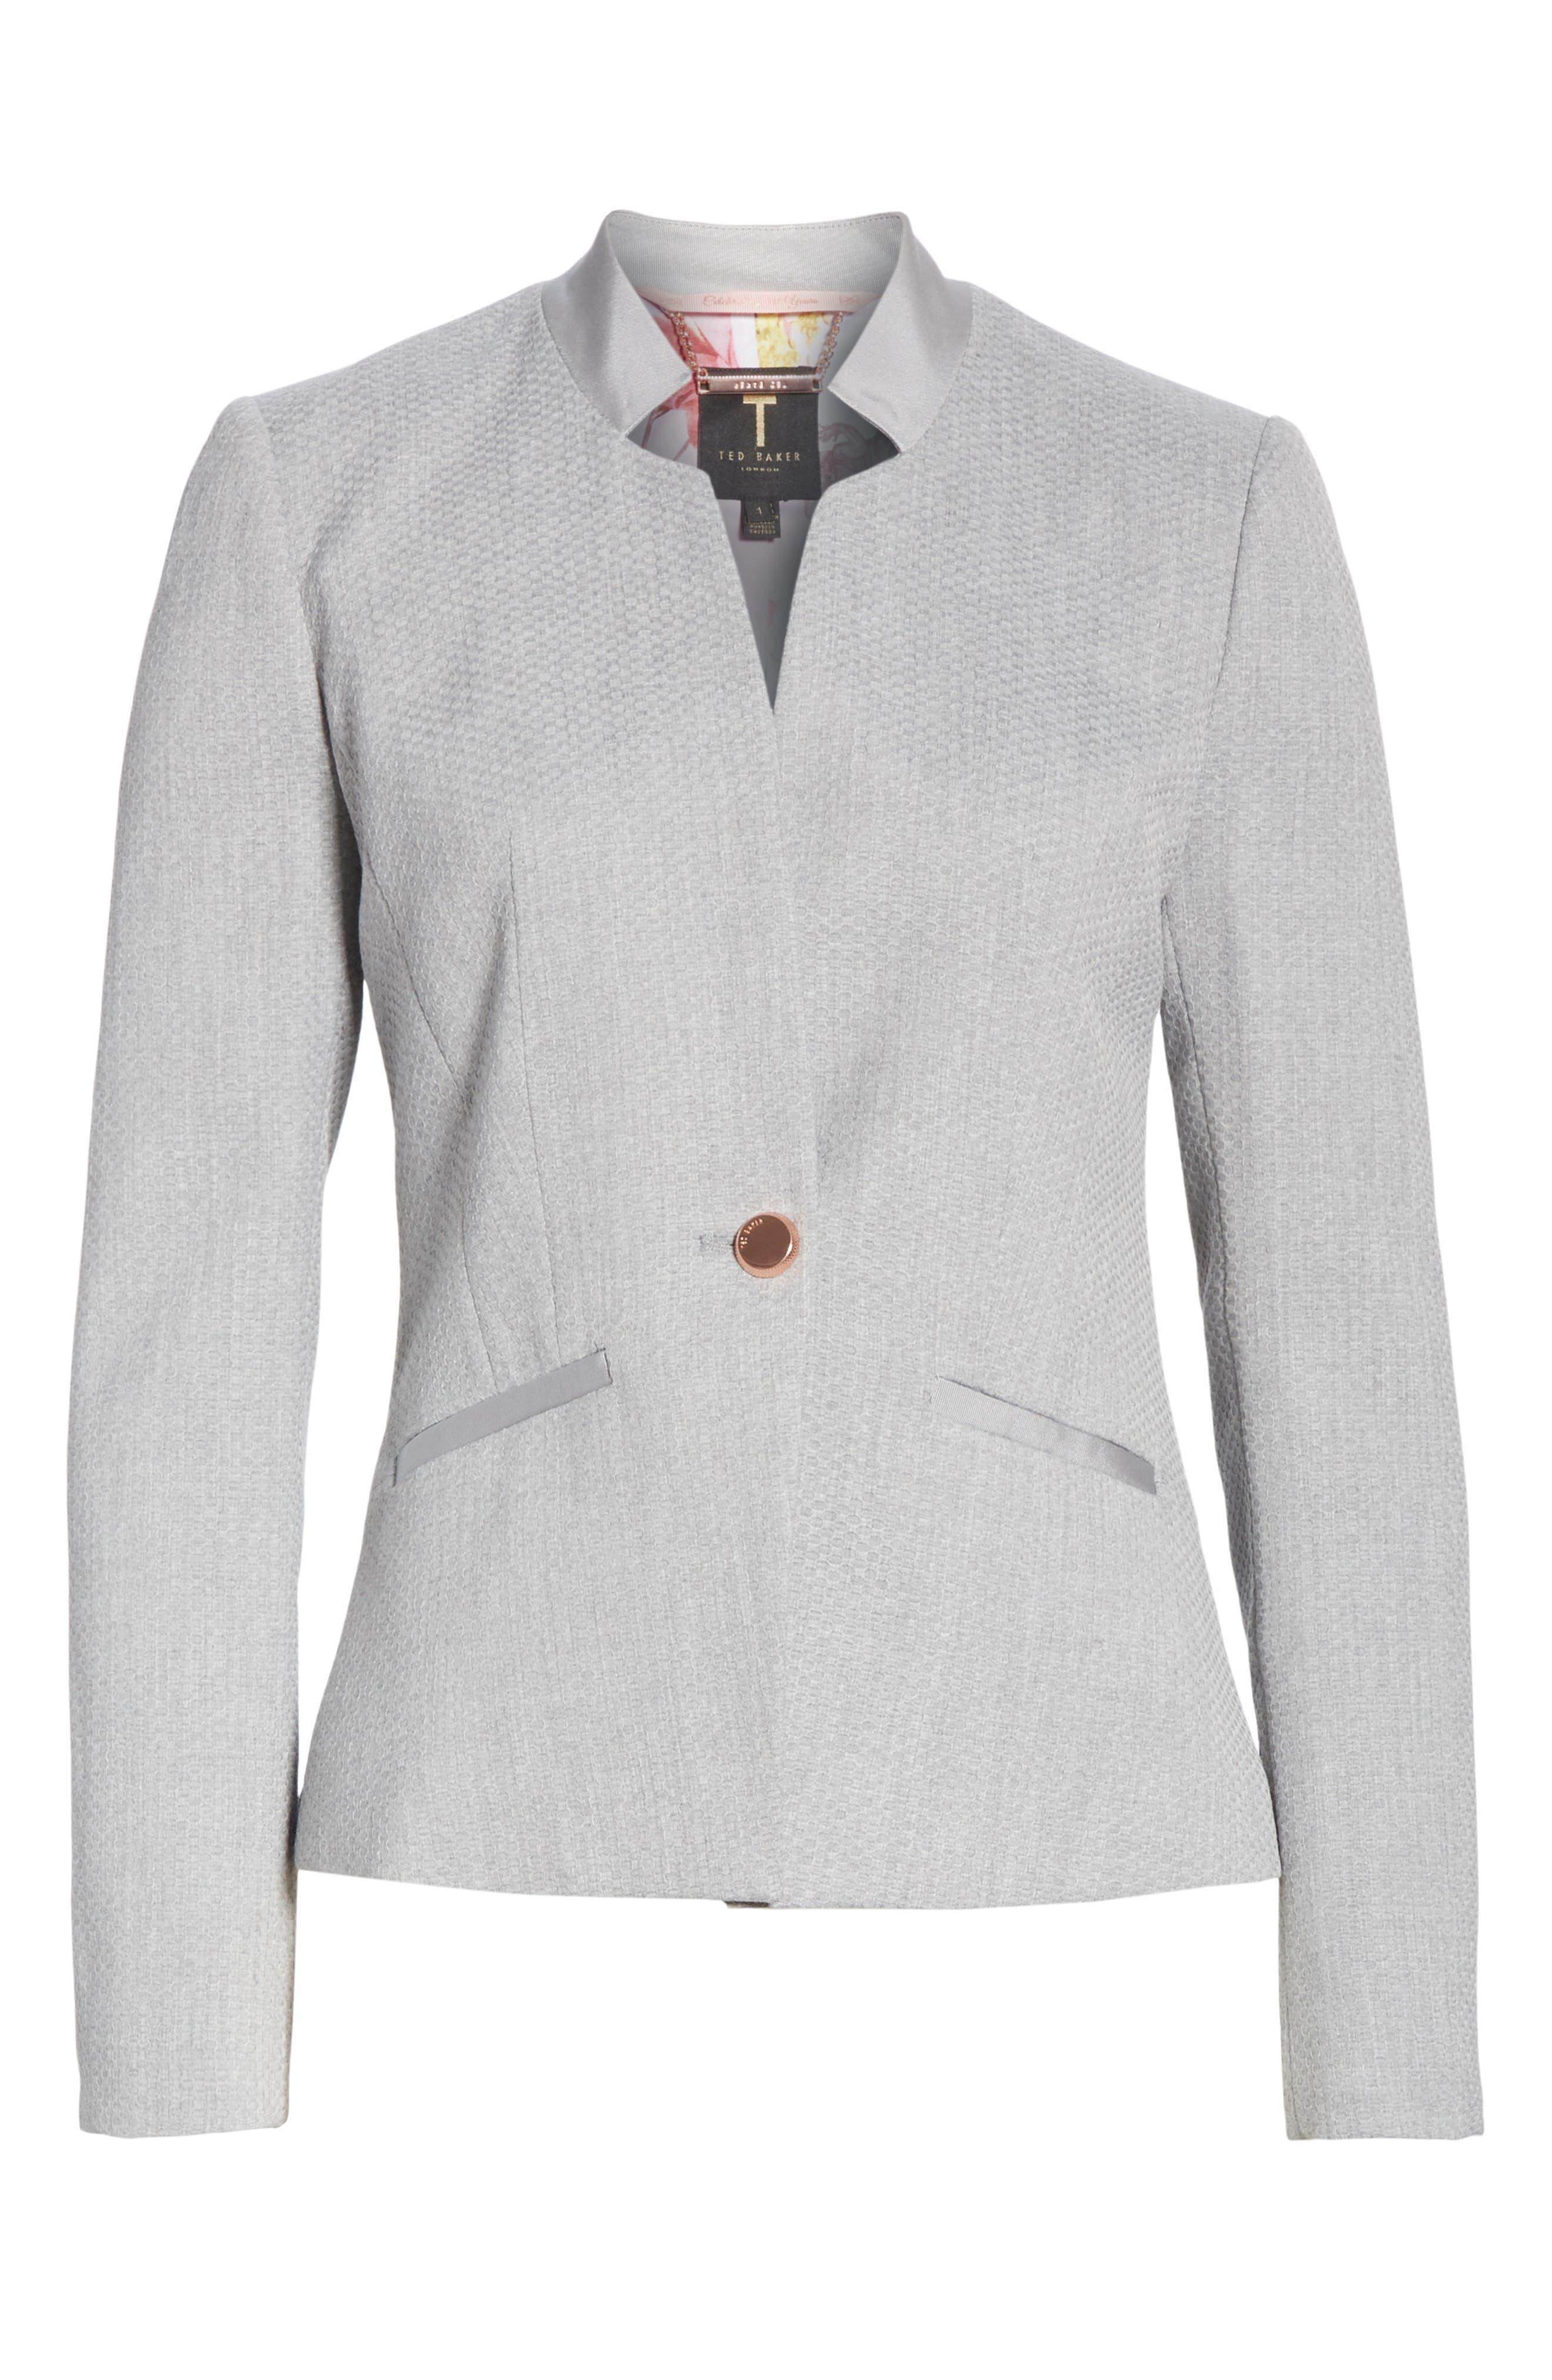 Ted Working Title Daizi Suit Jacket,                             Alternate thumbnail 5, color,                             GREY